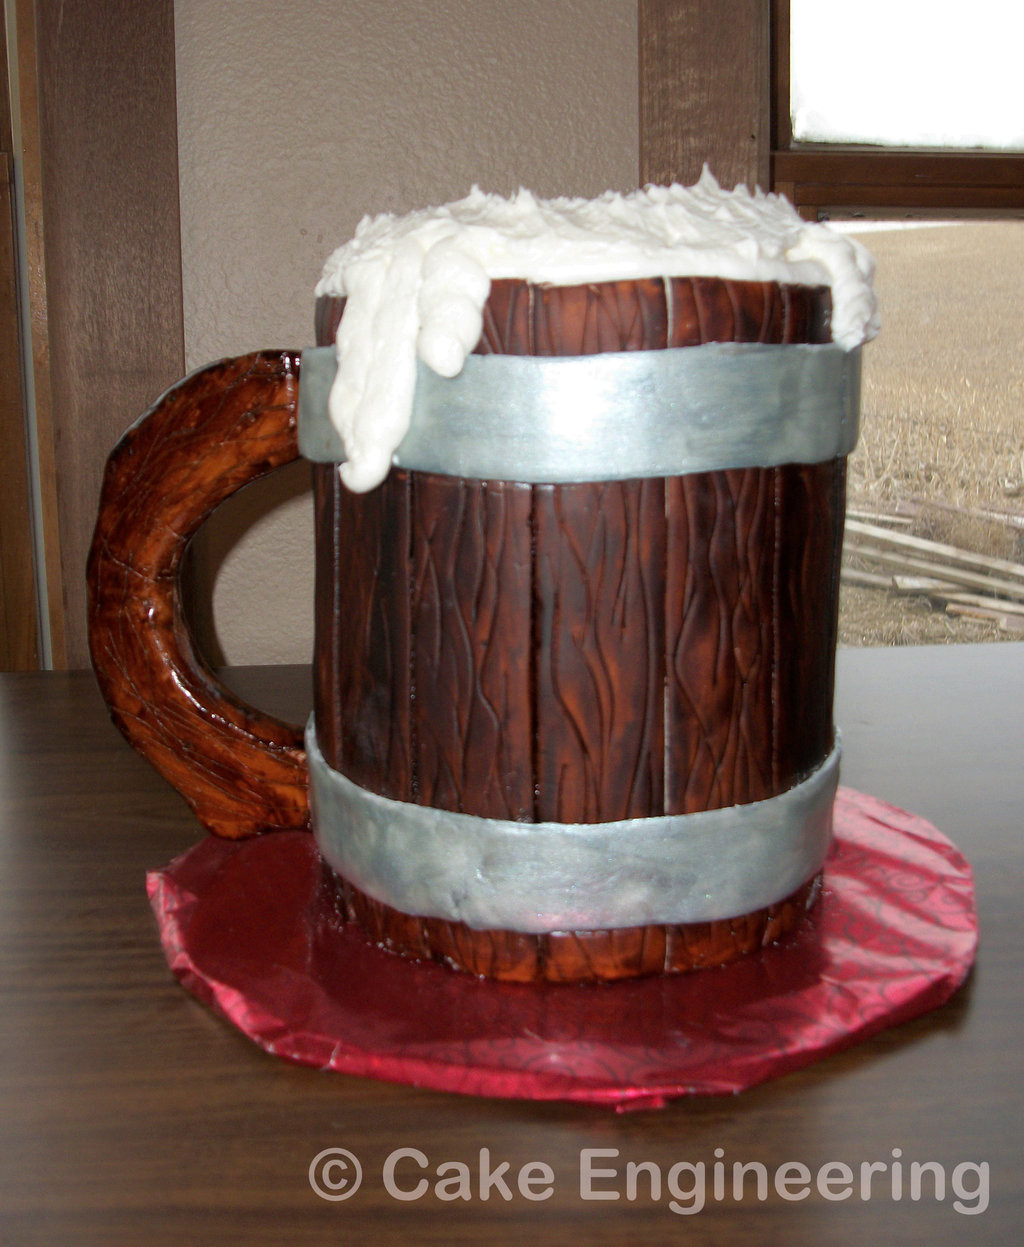 Beer Mug Cake  Beer Mug Cake by cake engineering on DeviantArt